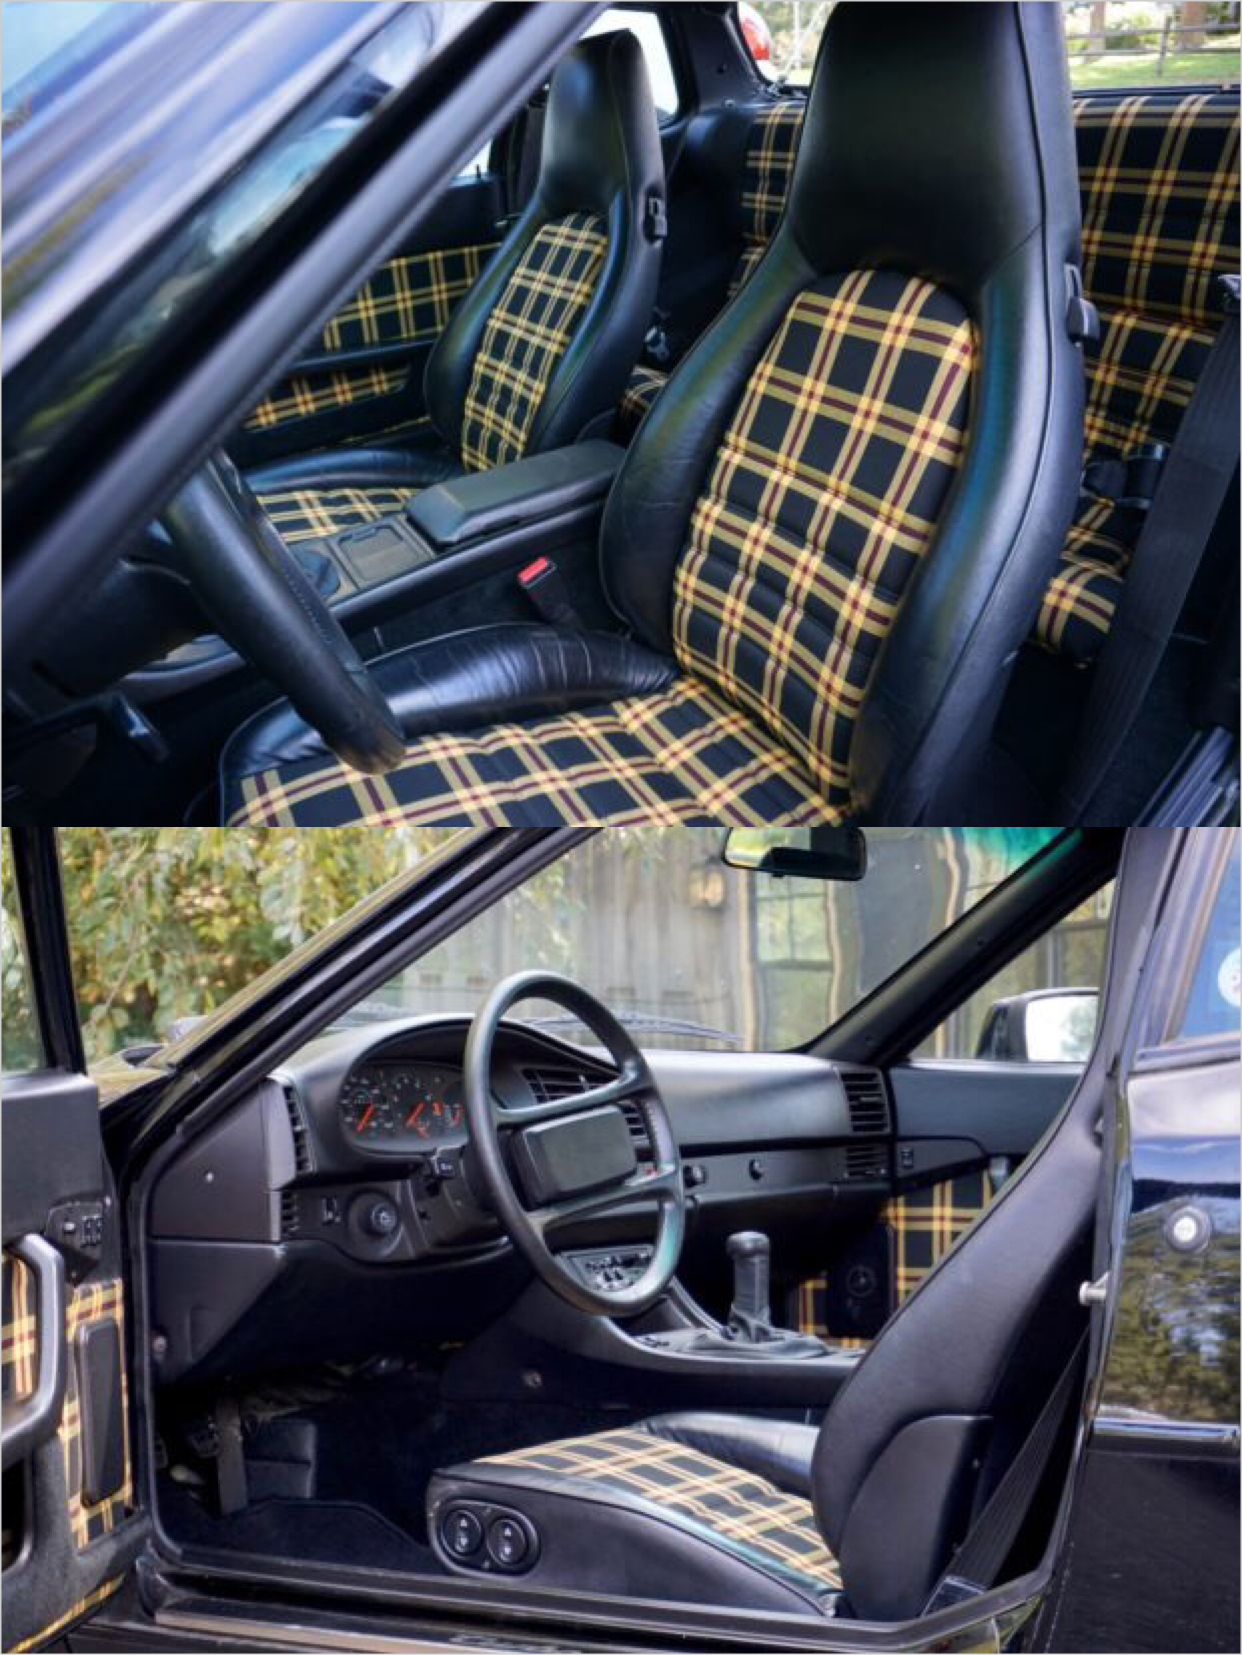 Porsche 944 Custom Plaid Tartan Interior Seat Inserts And Door Panels Porsche 944 Porsche Porsche 924